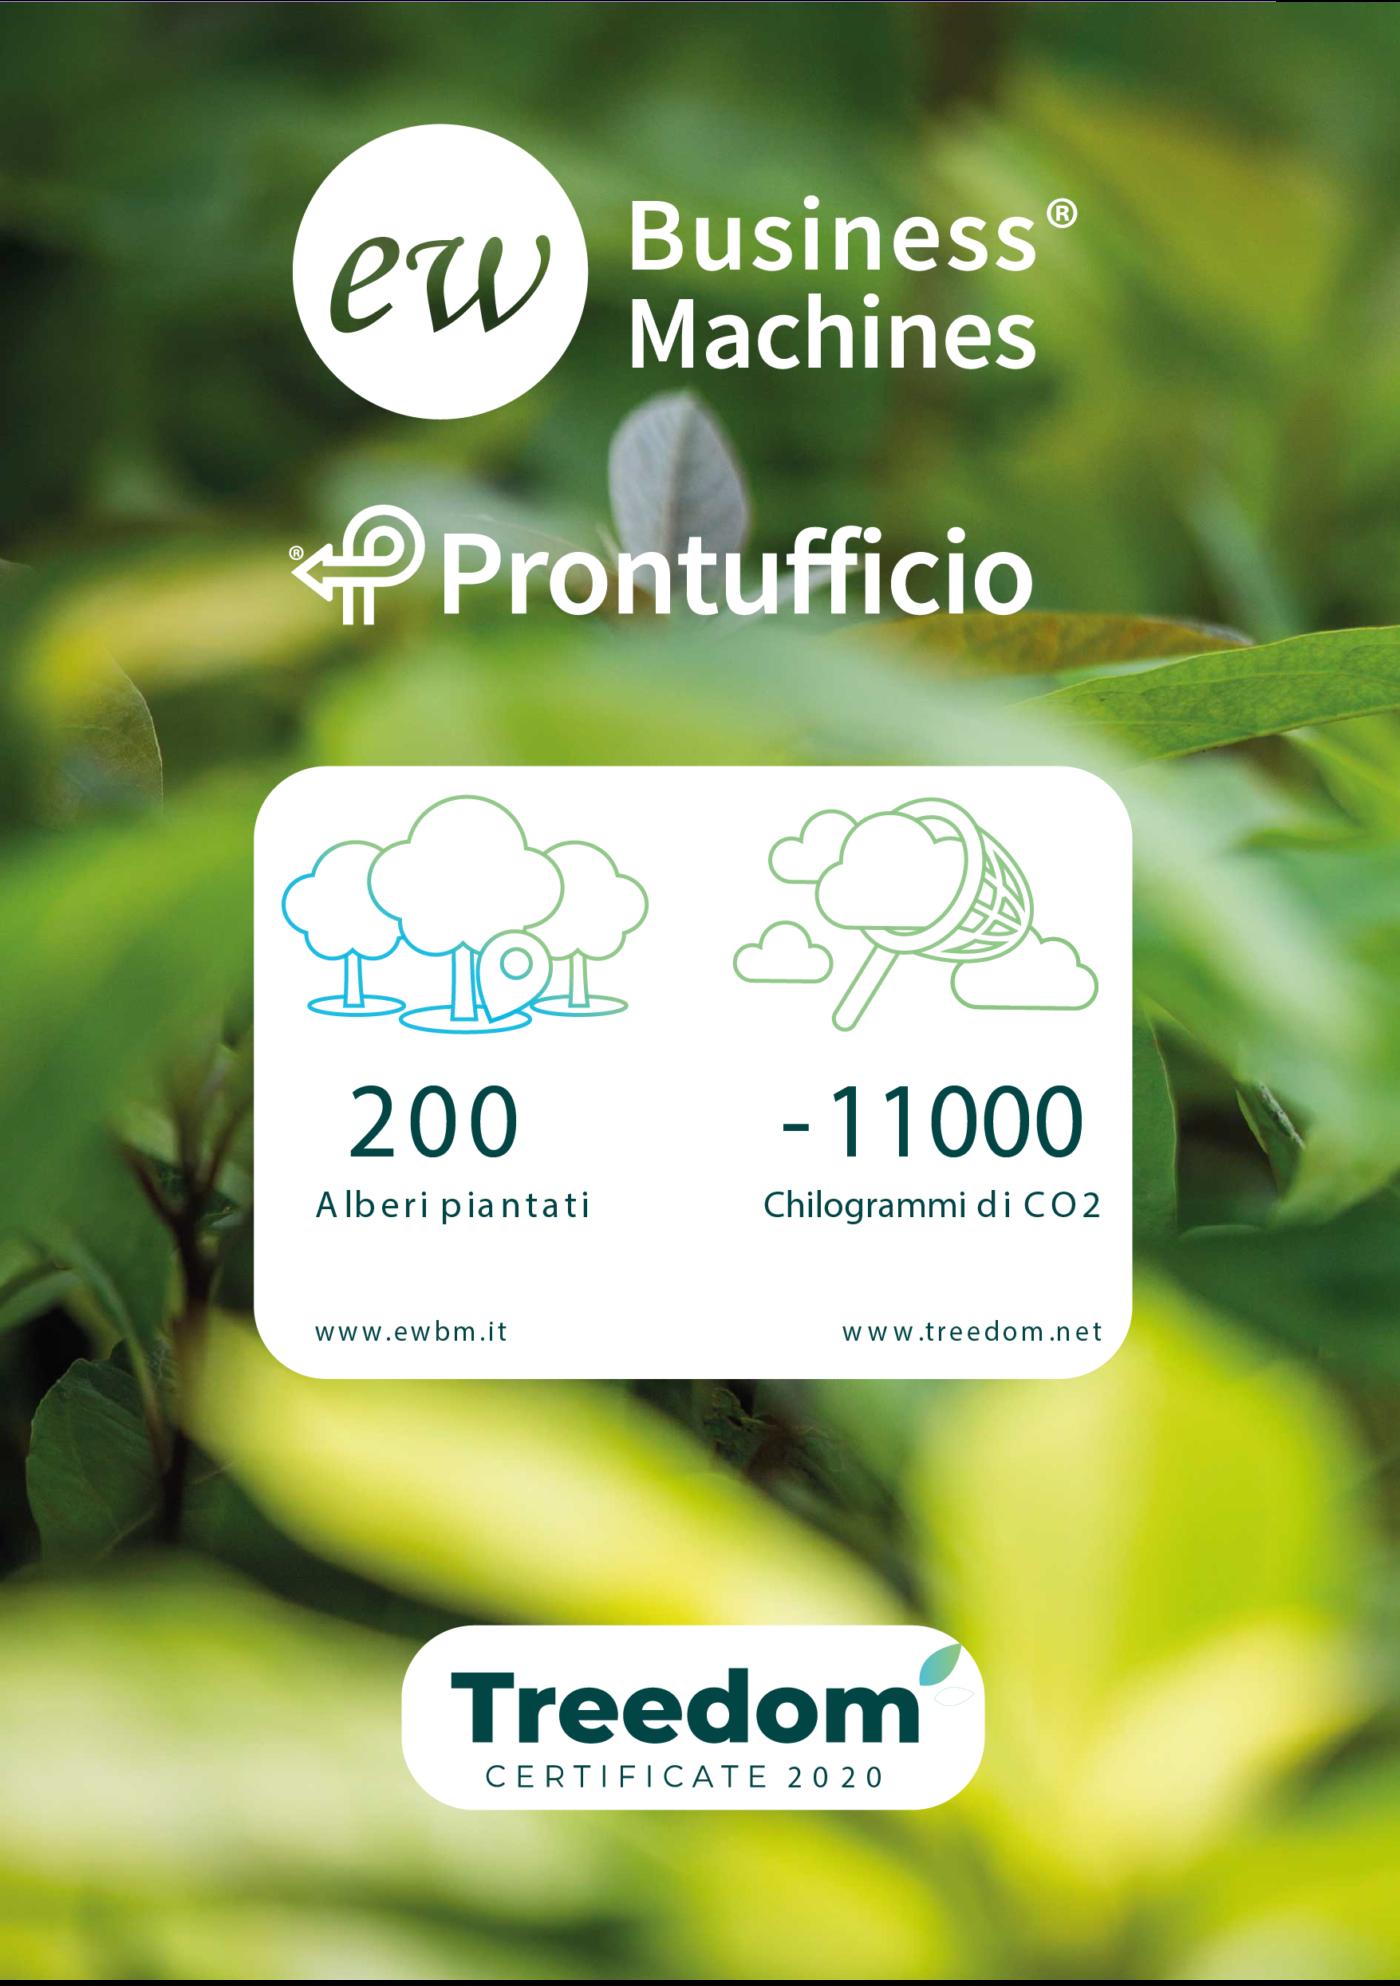 treedom - Foresta ewbm Prontufficio